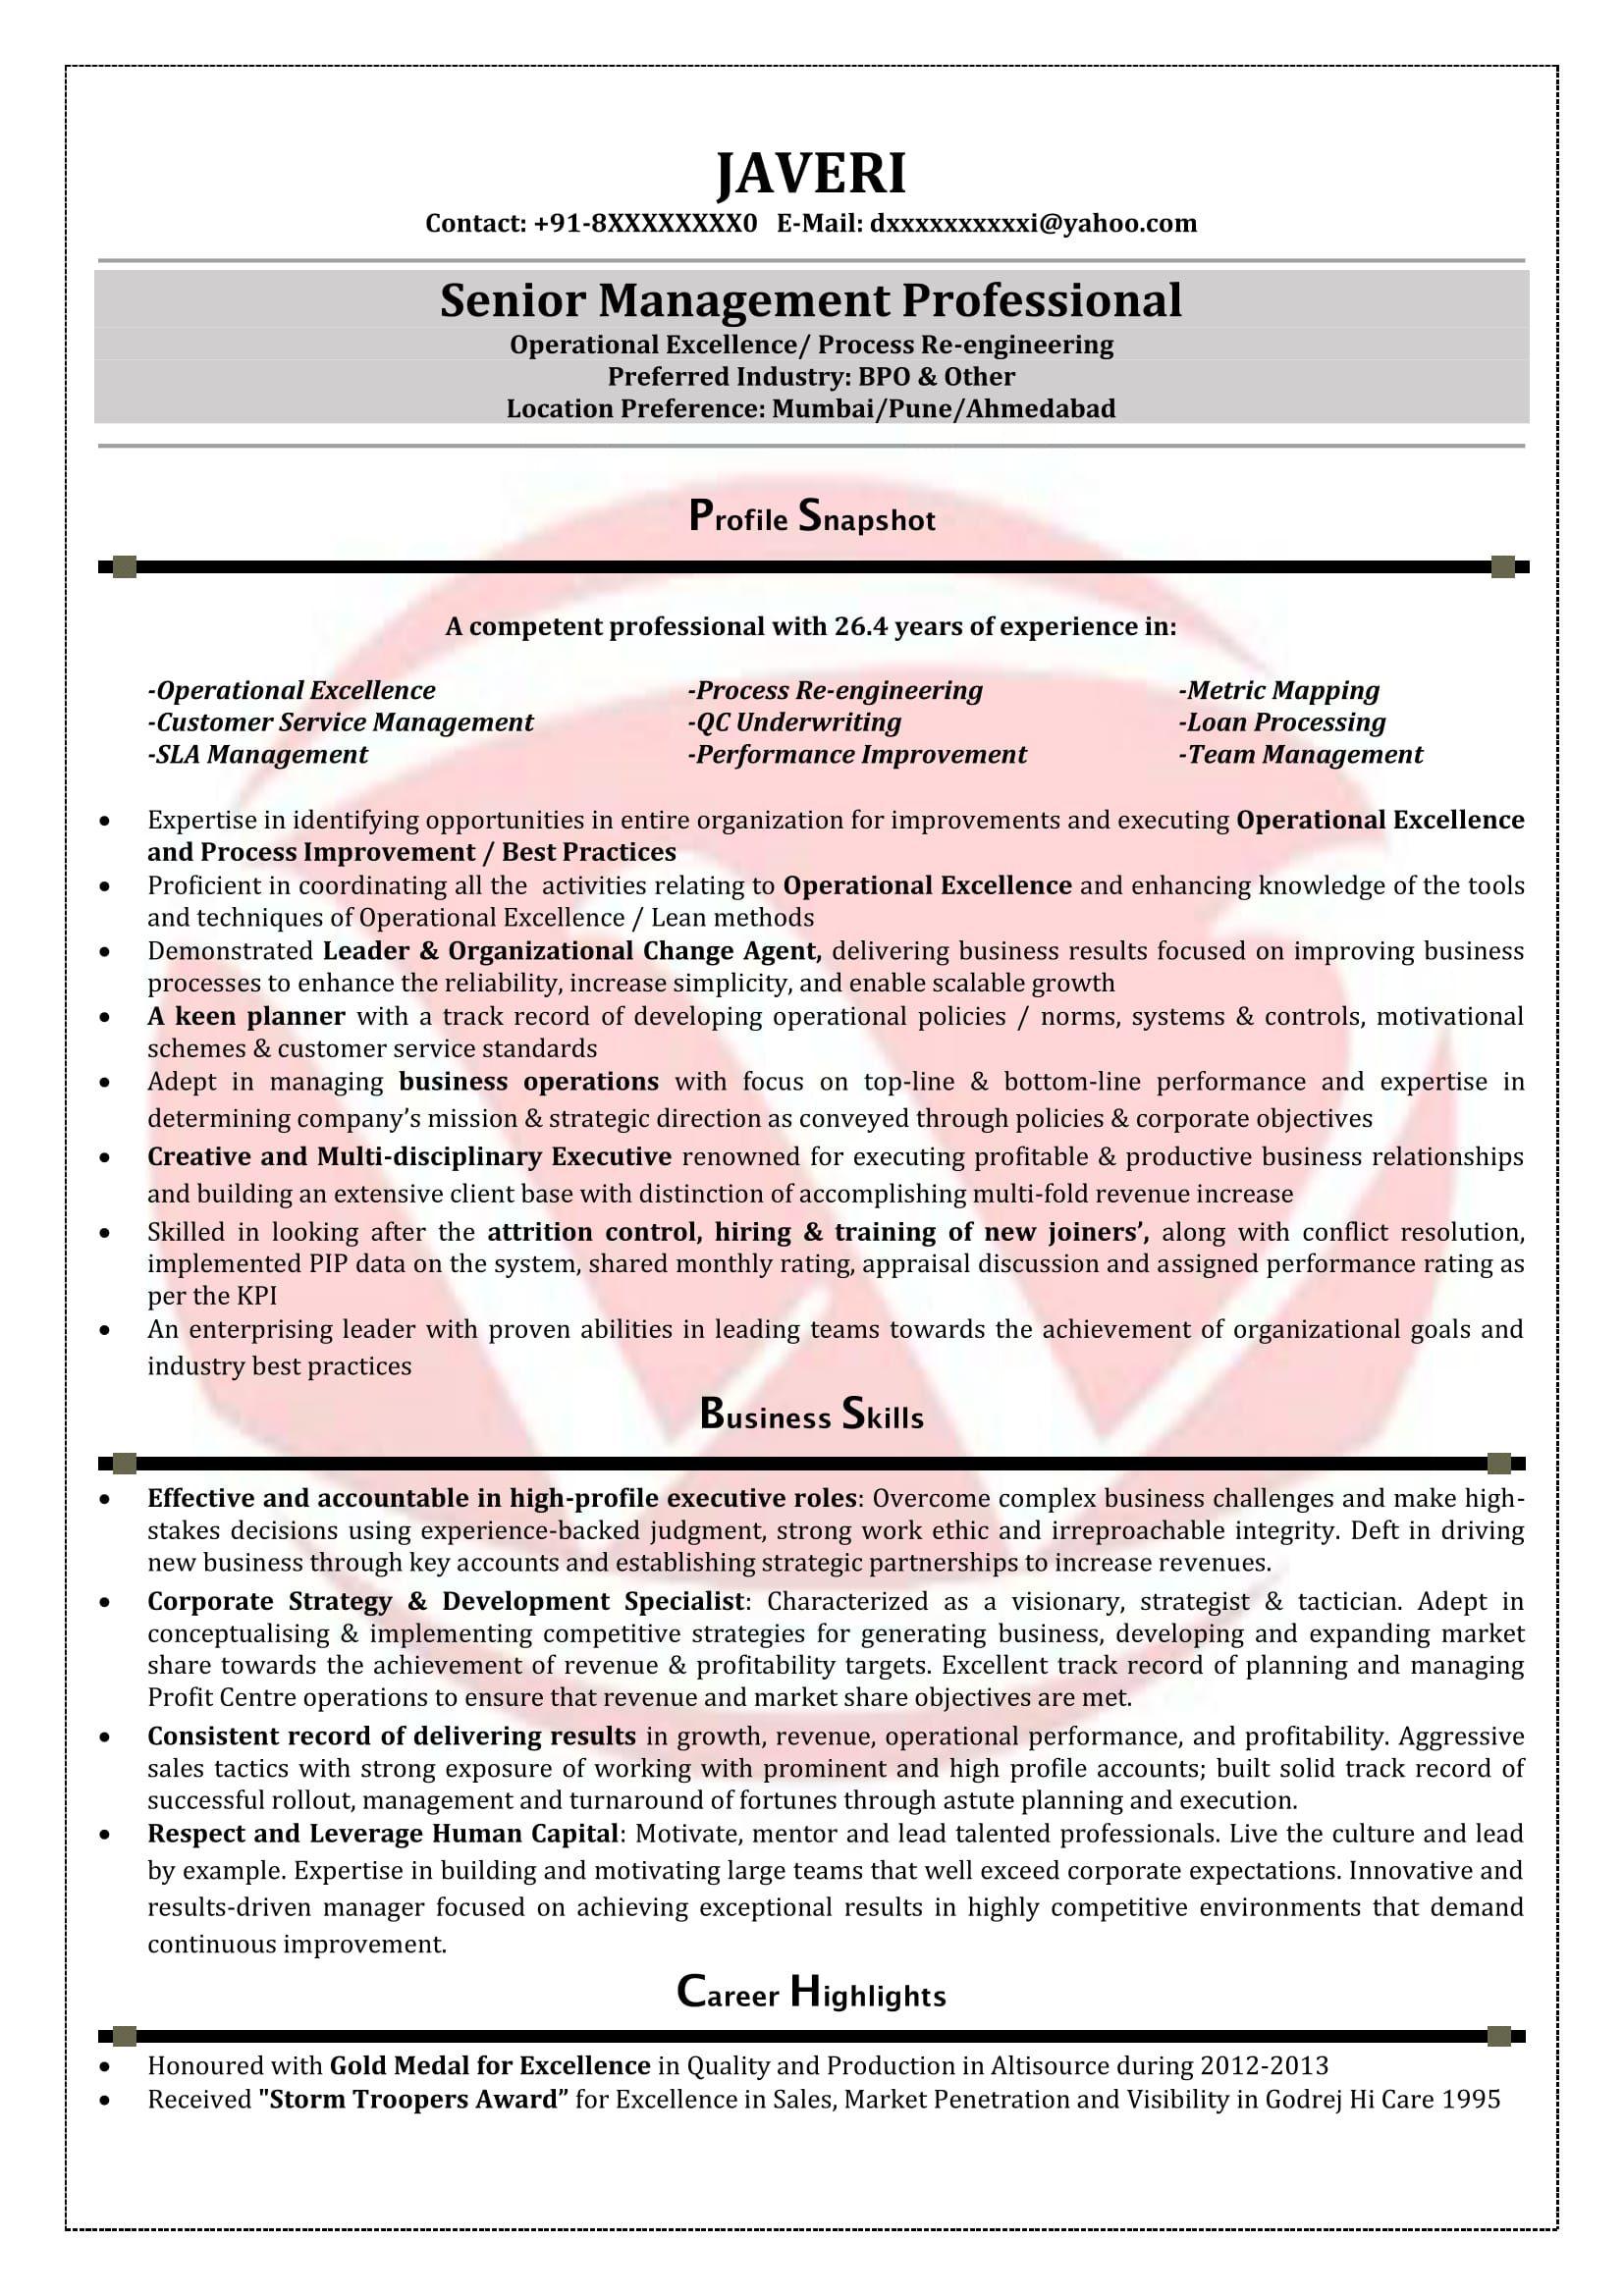 Resume Format Kpo Resume format, Resume, Resume templates